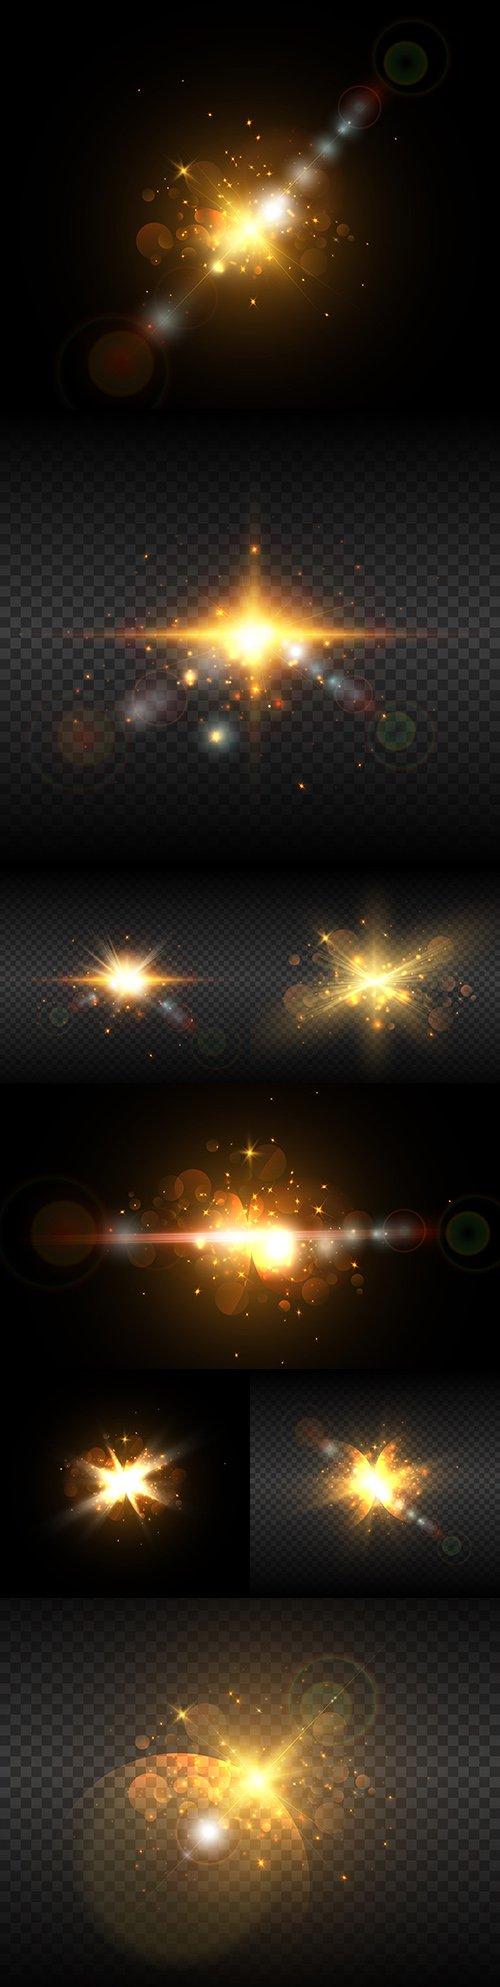 Light effects gold sparkling elements dark background 22